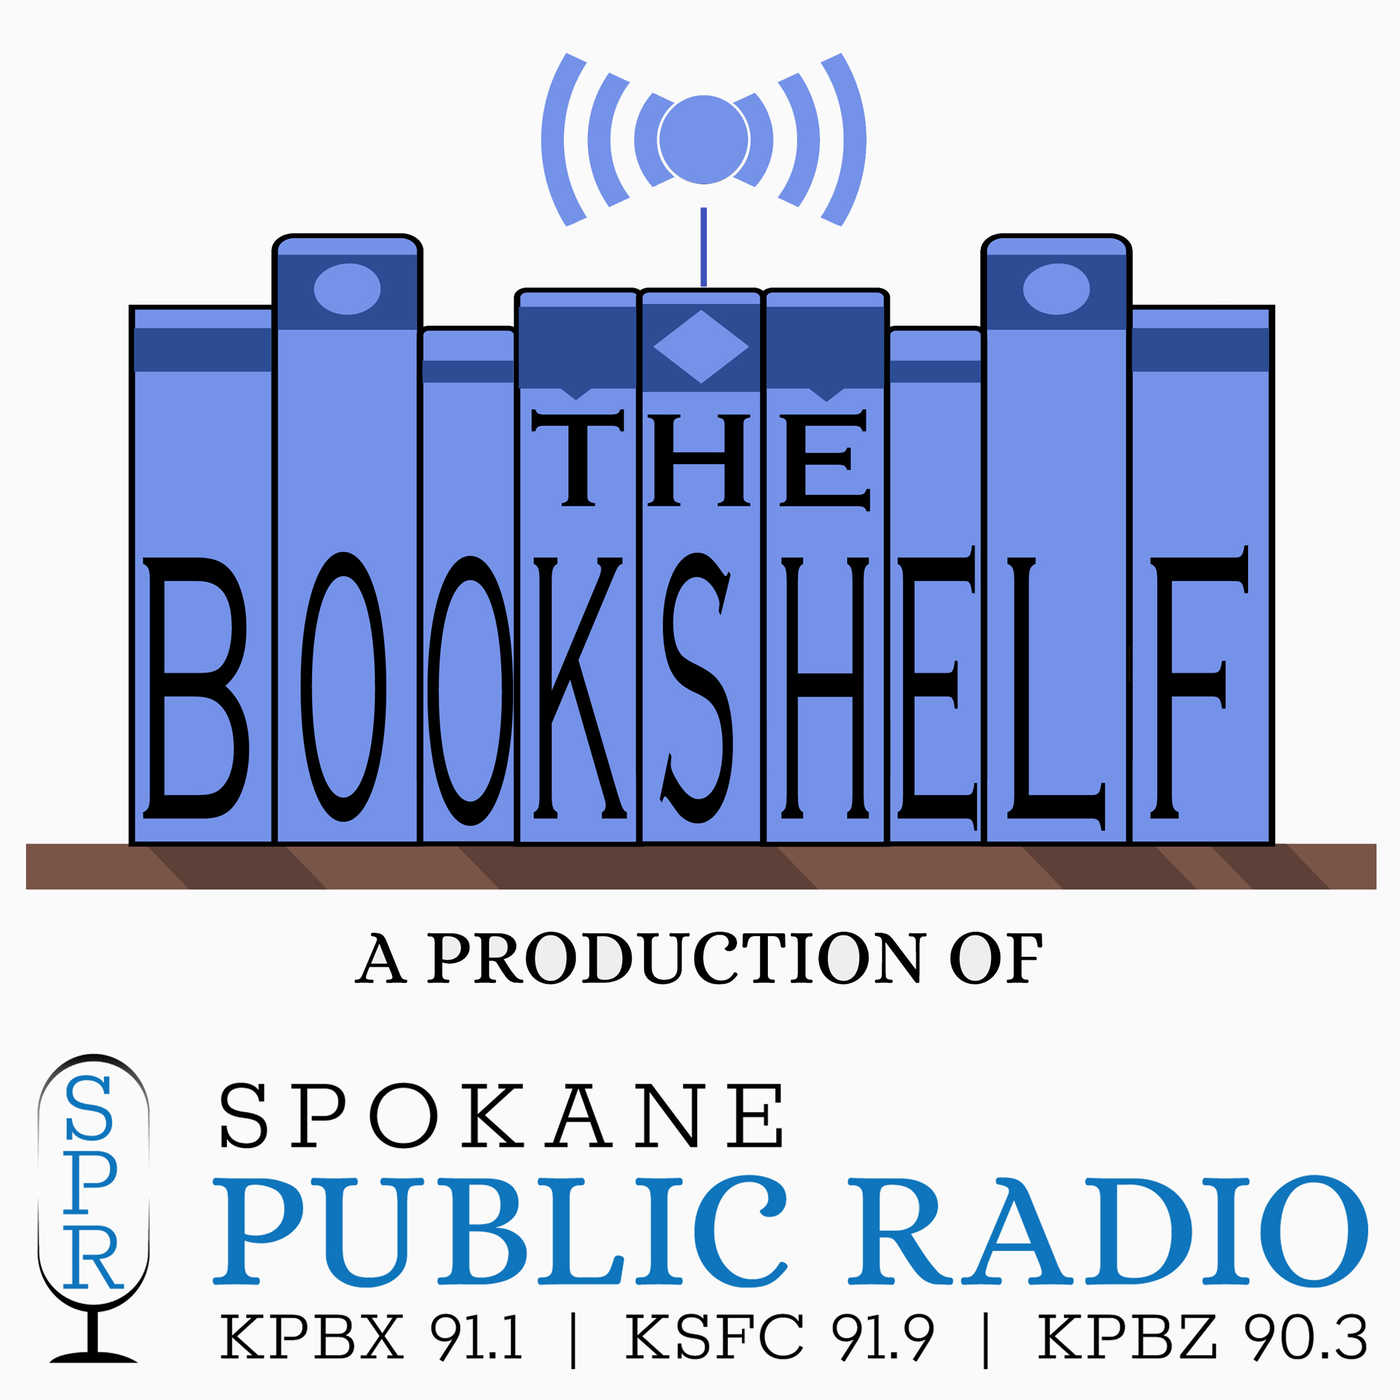 The Bookshelf NPR